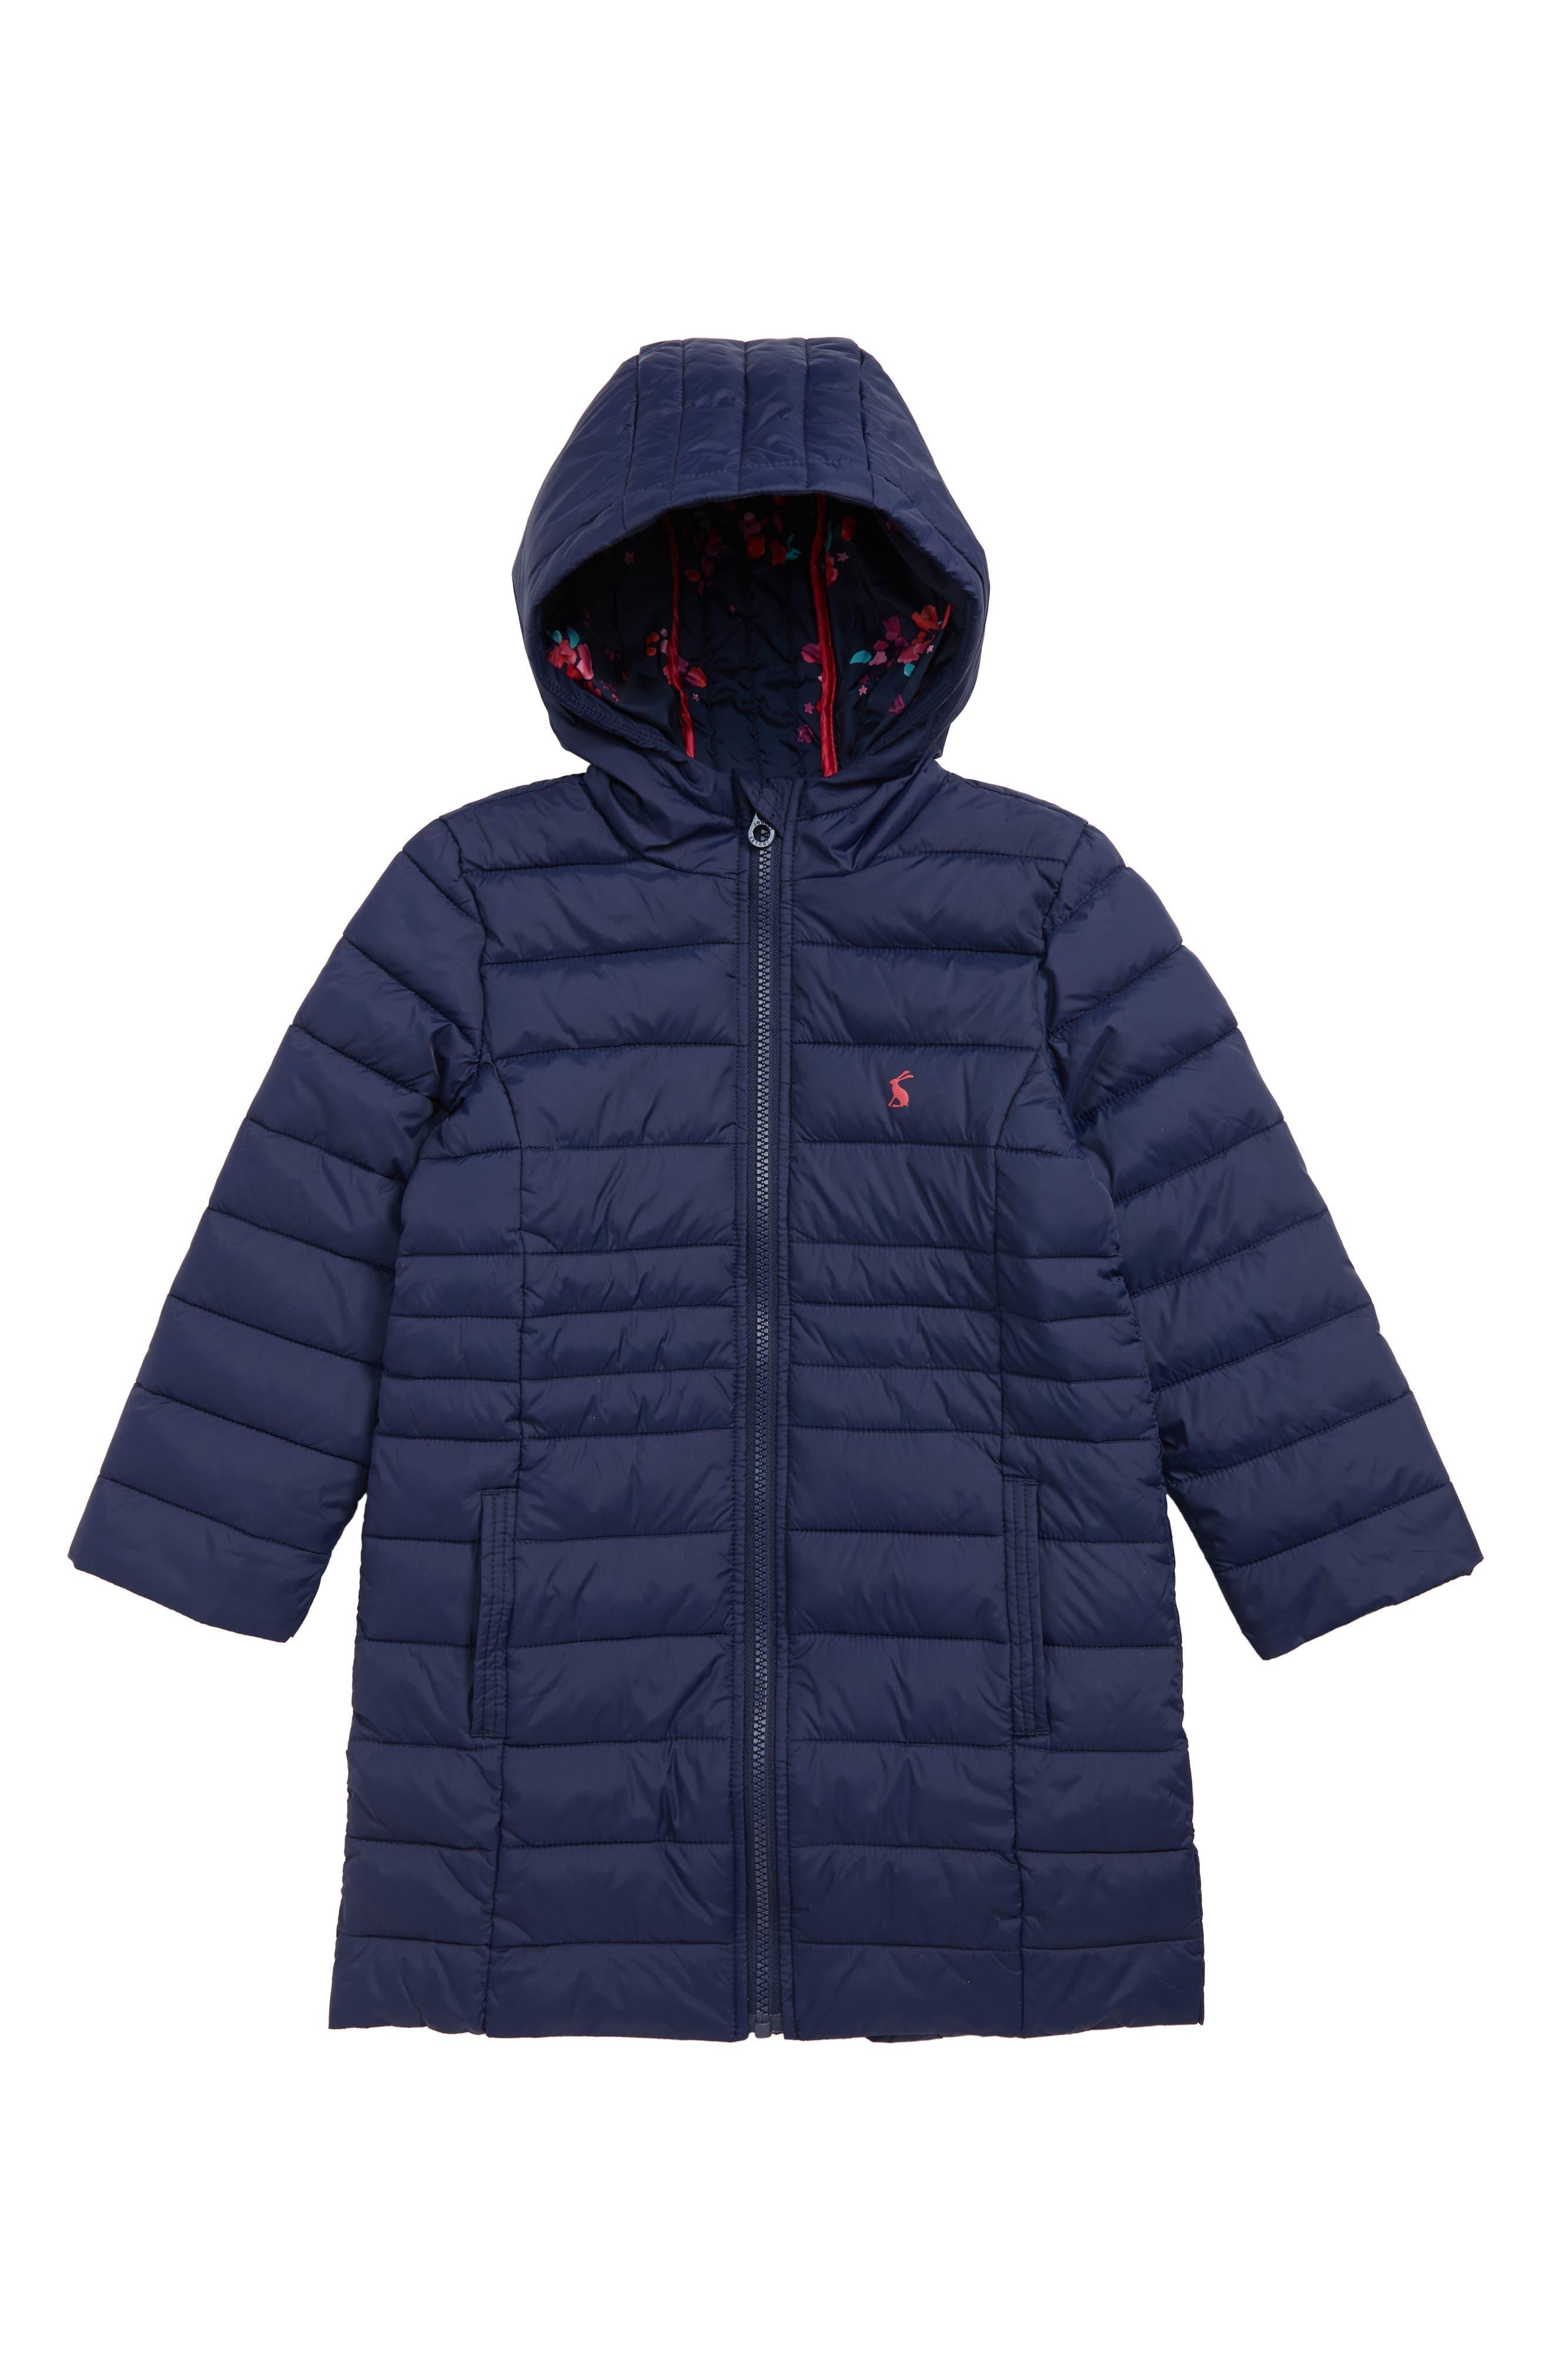 Packaway Hooded Jacket,                             Main thumbnail 1, color,                             411